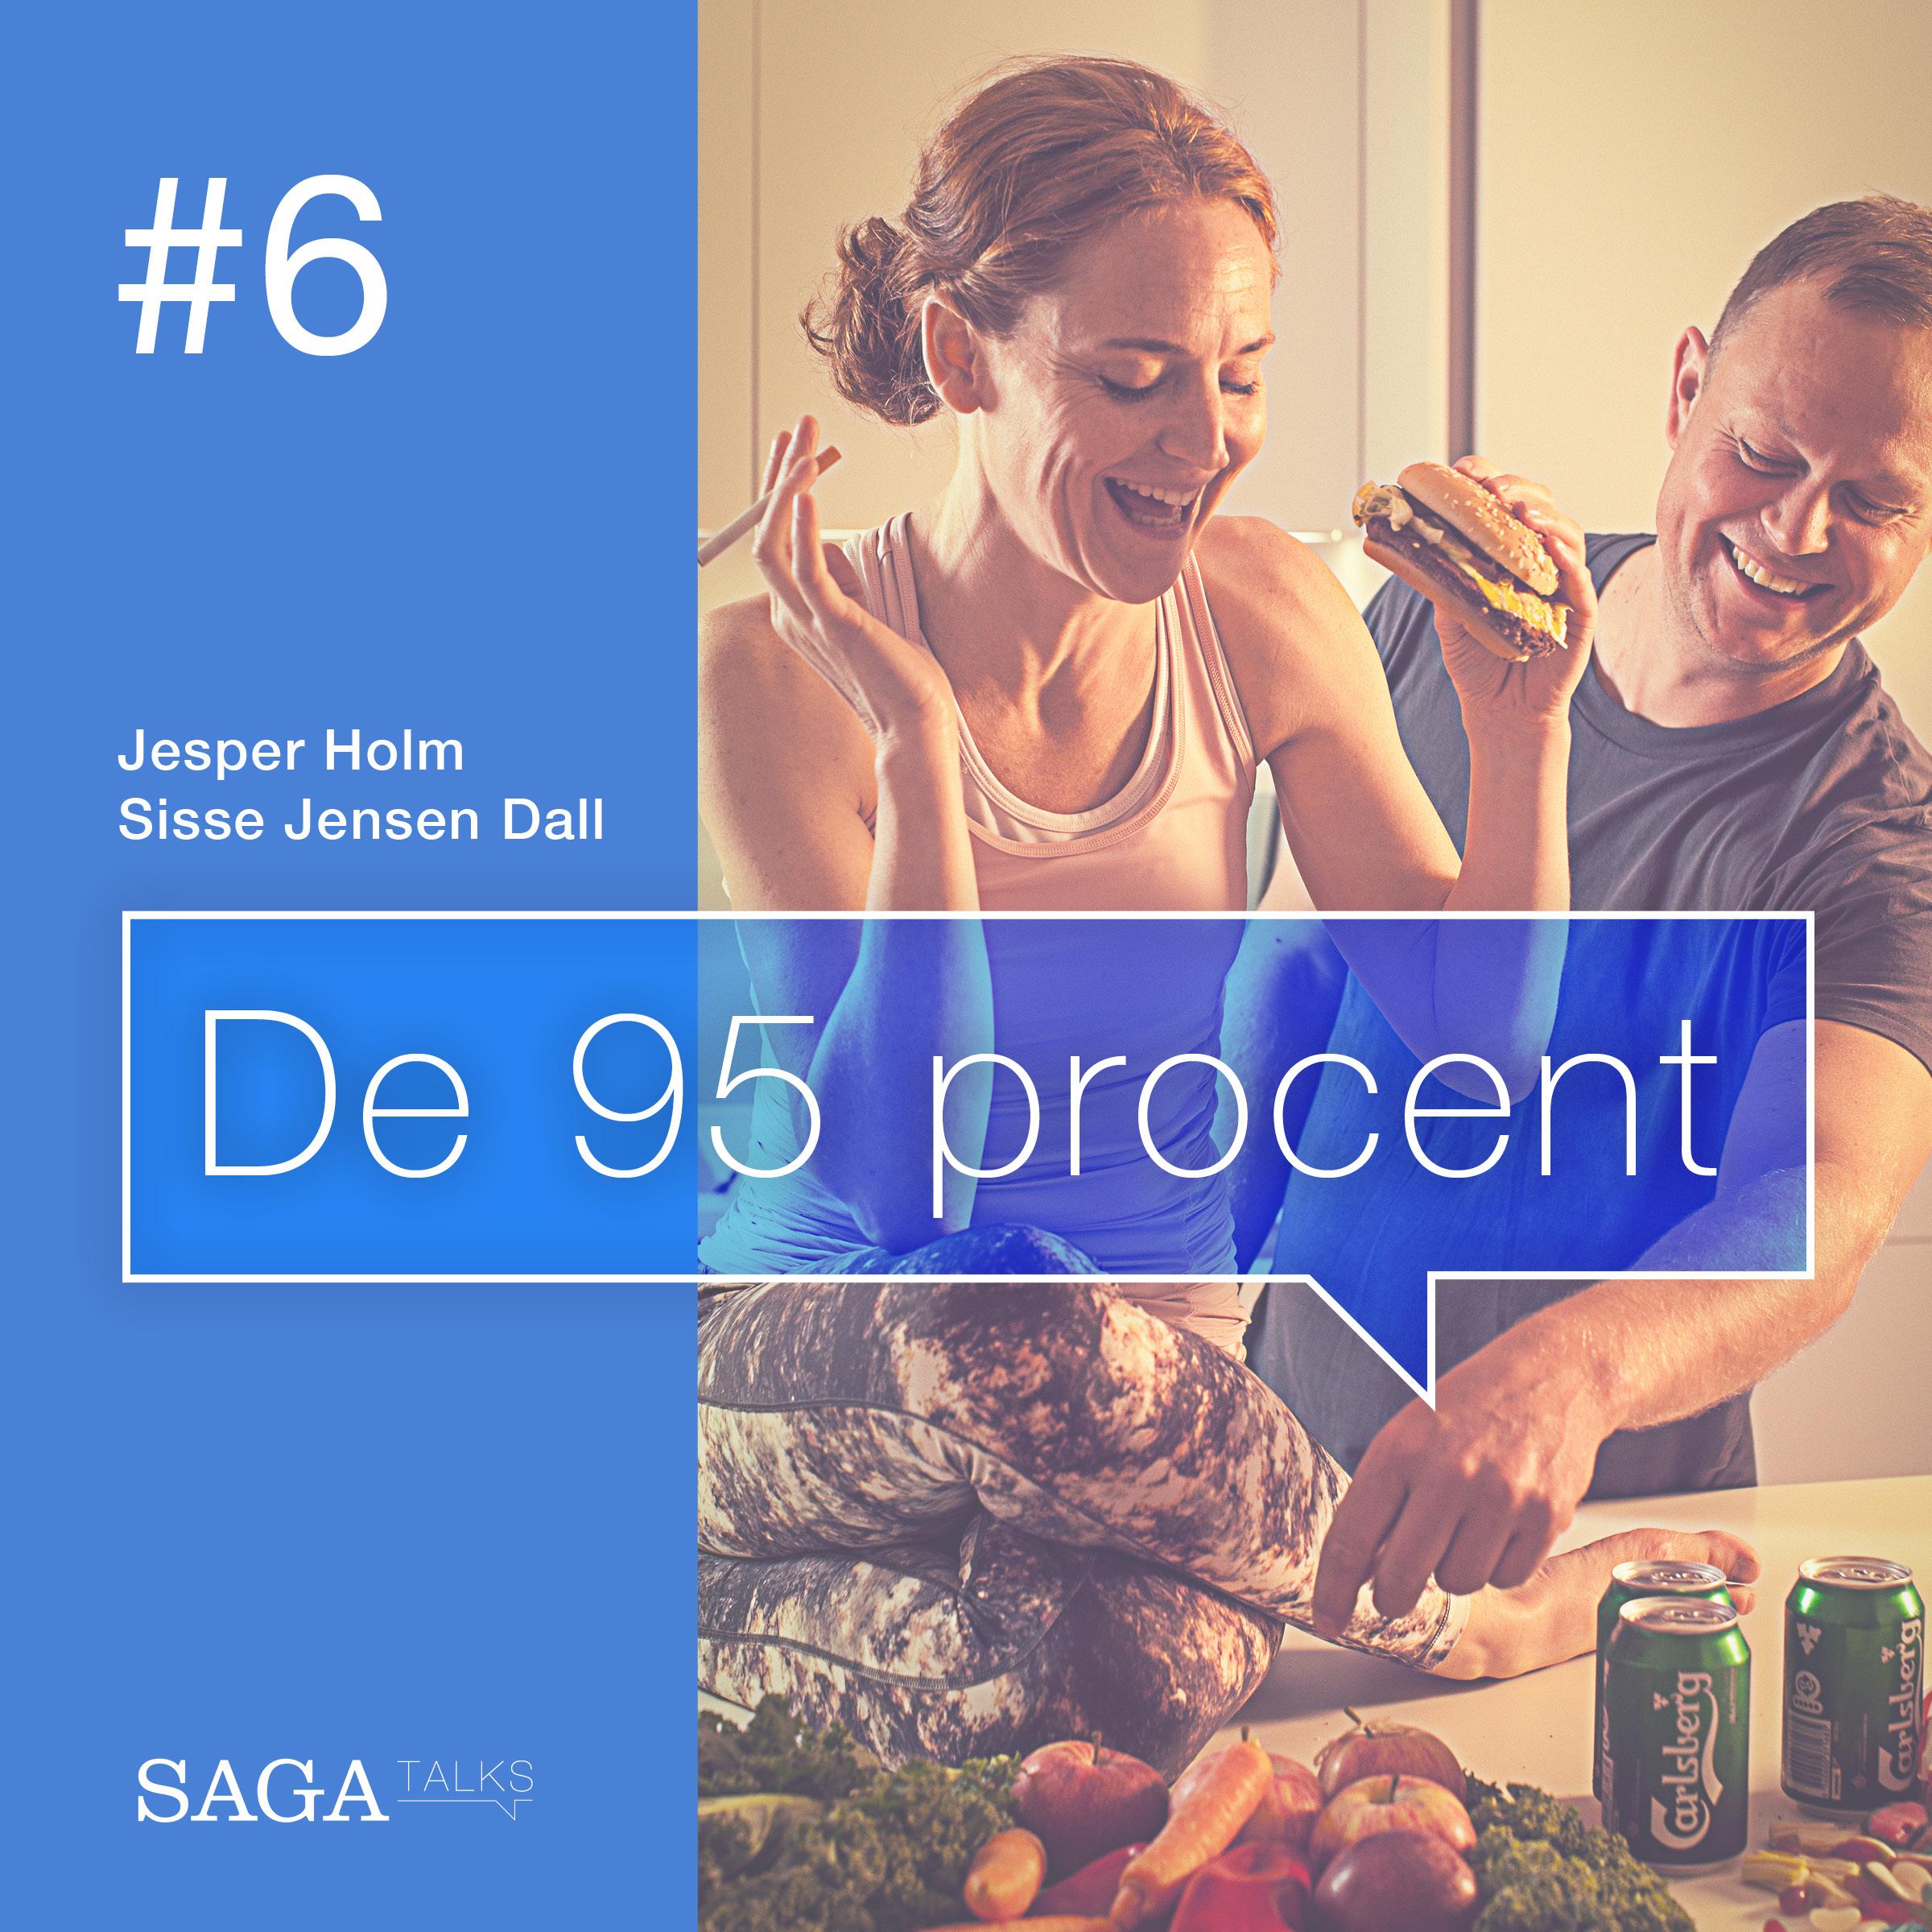 De 95 procent #6 - Palæo, vegansk, Raw, Atkins, LCHF. - E-lydbog